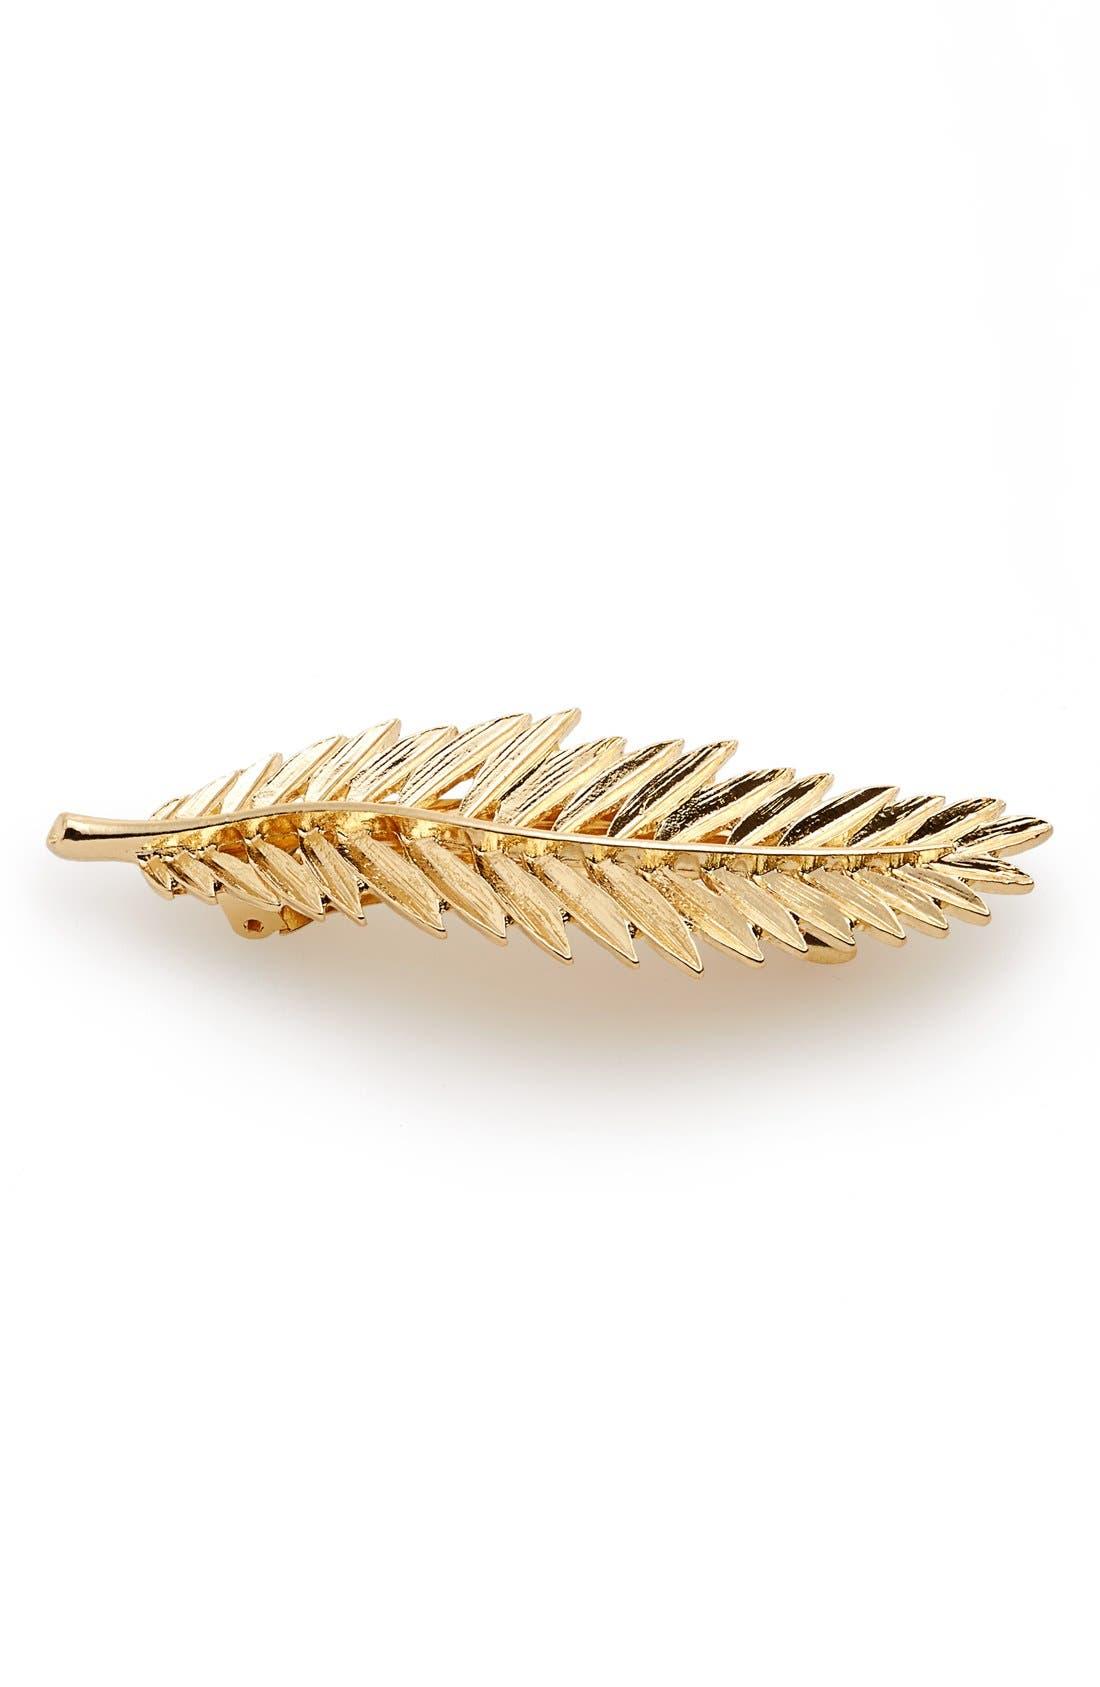 Alternate Image 1 Selected - Cara 'Gold Leaves' Barrette